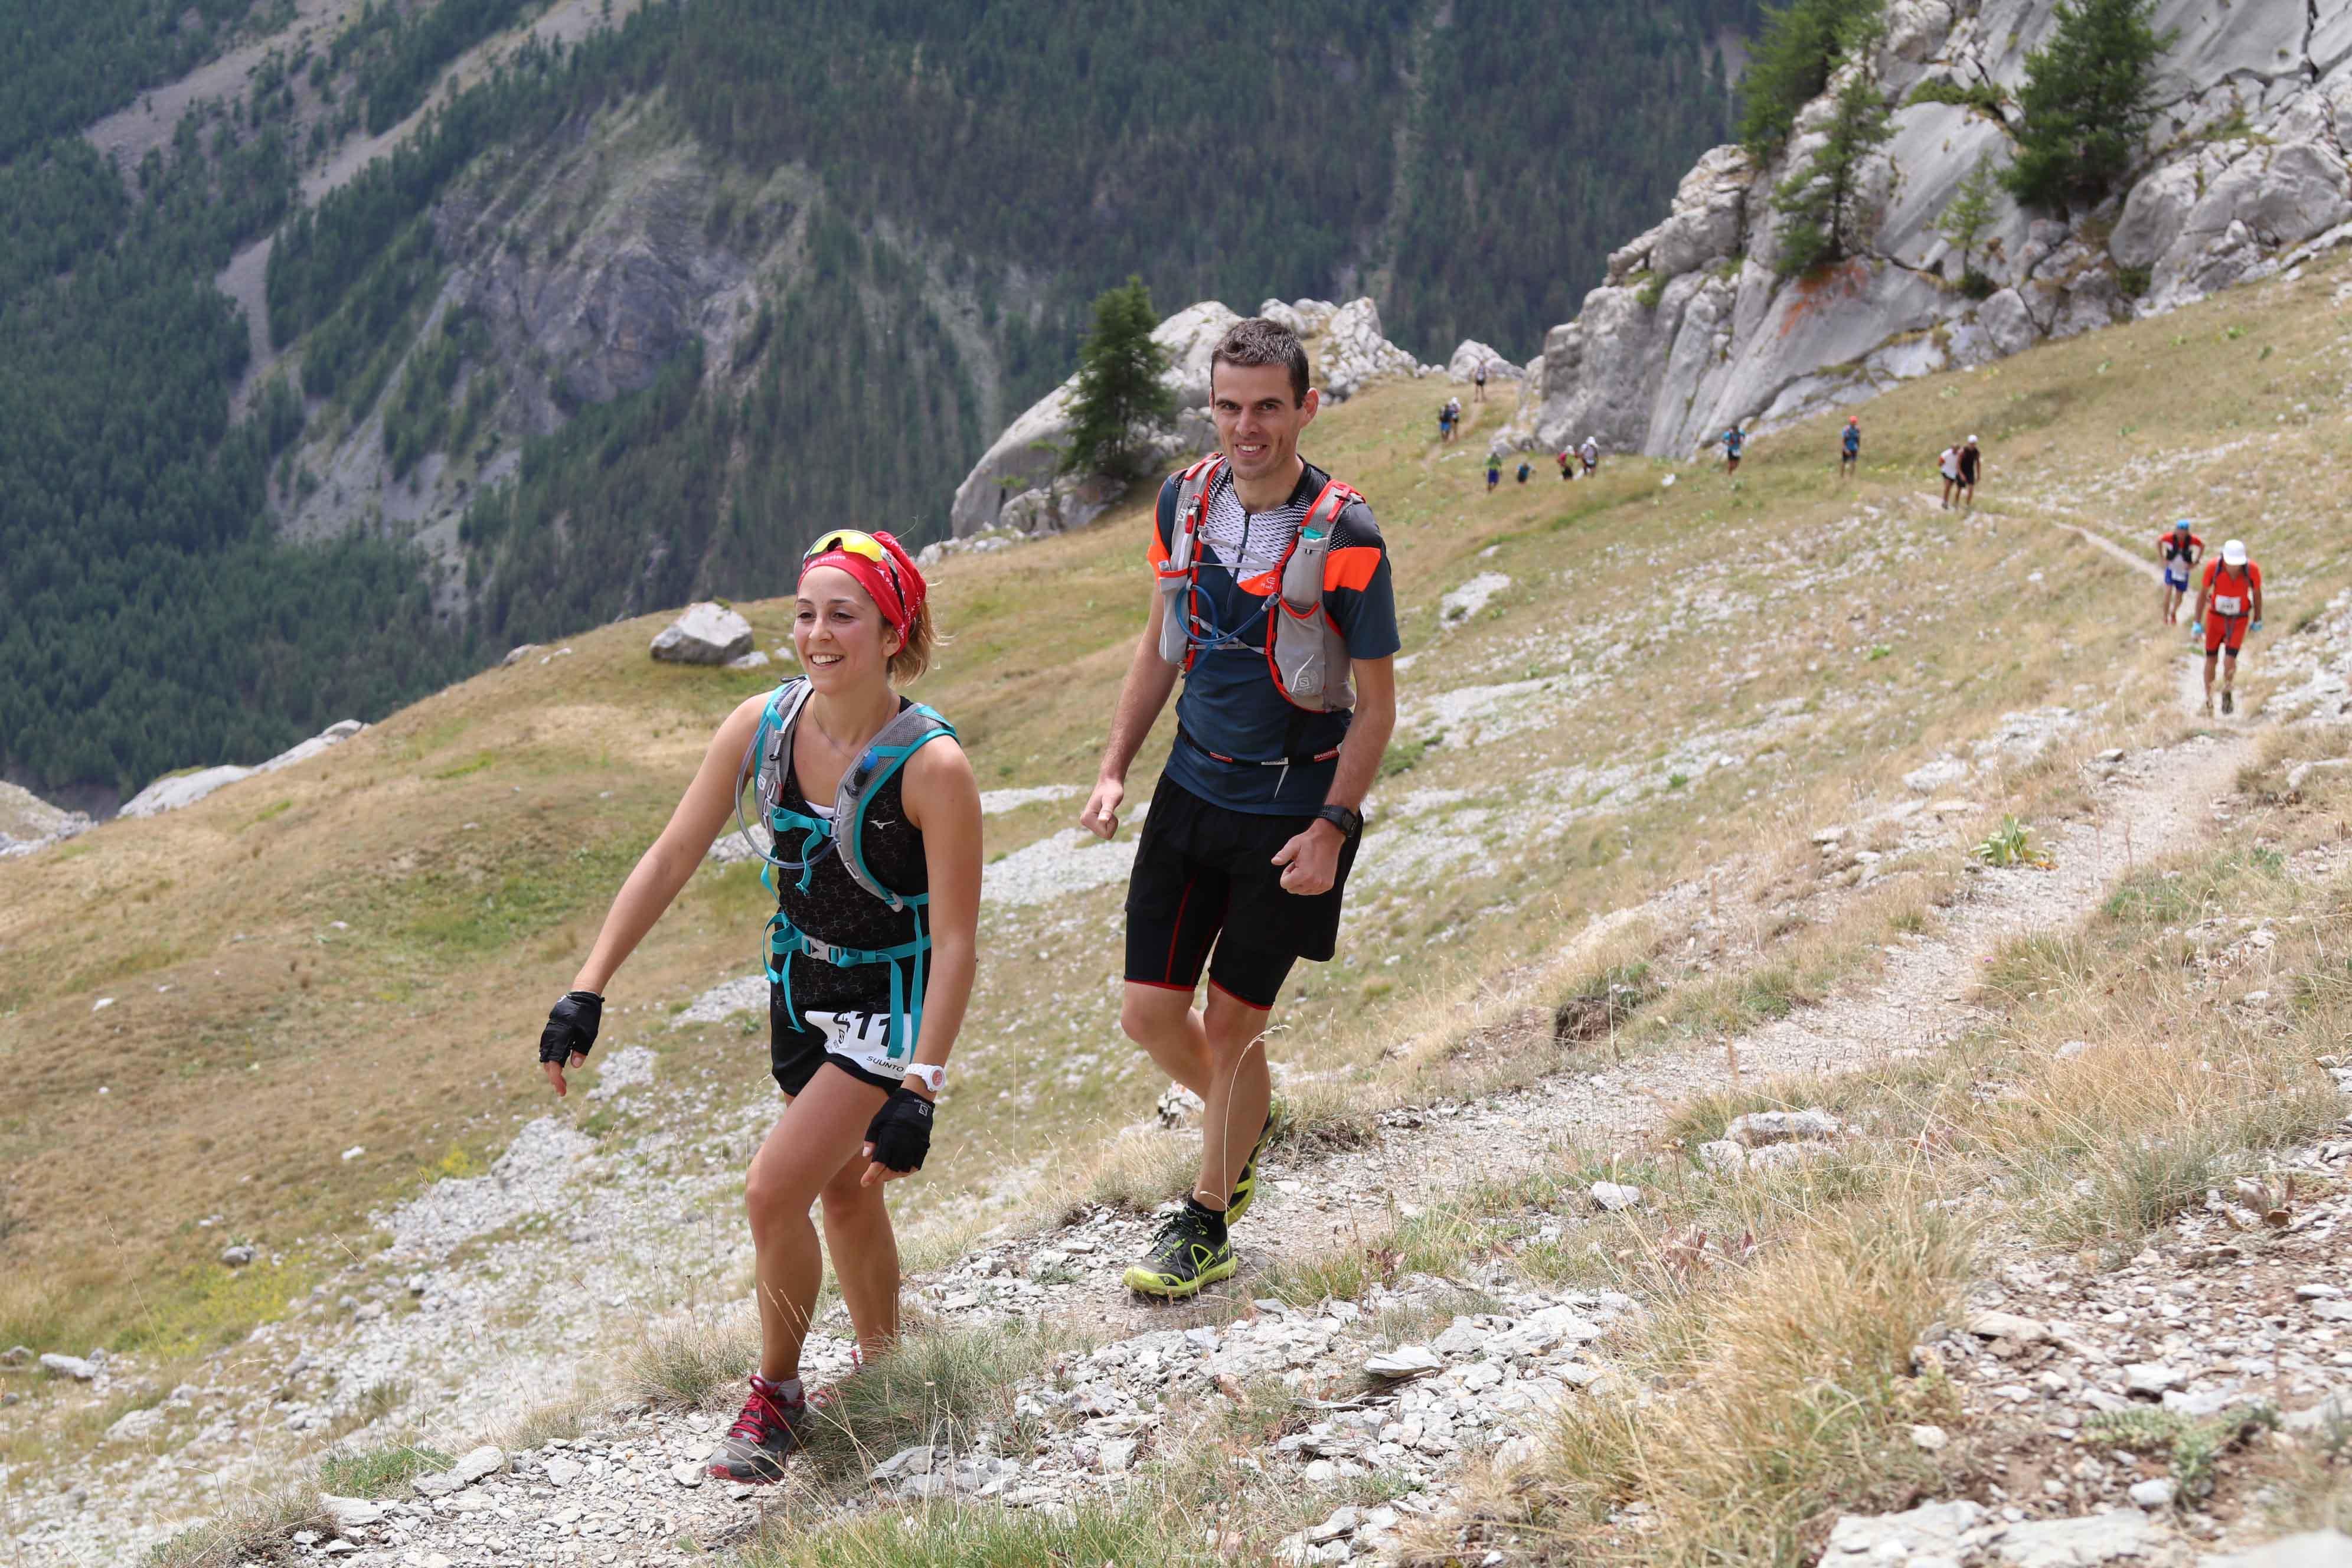 8 2017 Ambiance 42 km photo Robert Goin - Juliet Champion, Mathieu Martinez et Romain Wyndaele, vainqueurs du Salomon Over the Mountain Running Challenge 2017